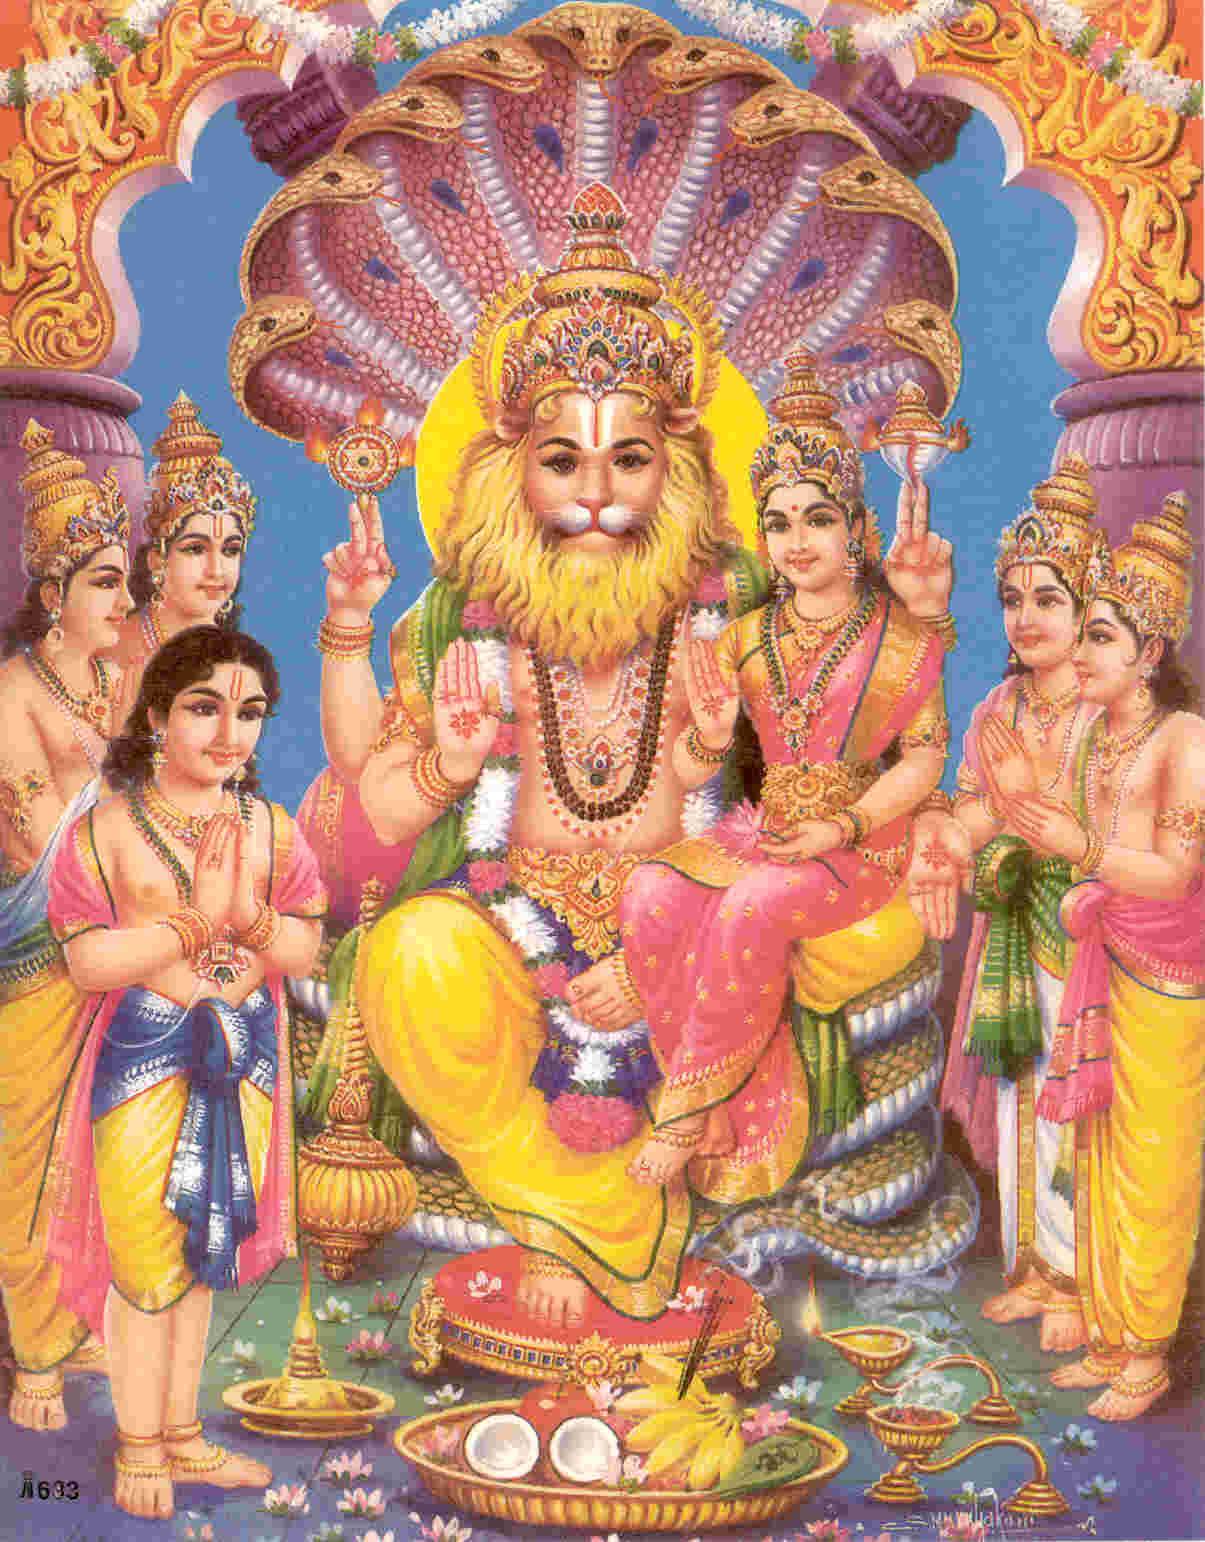 Malayalam songs free download mp3 devotional seventhebig.